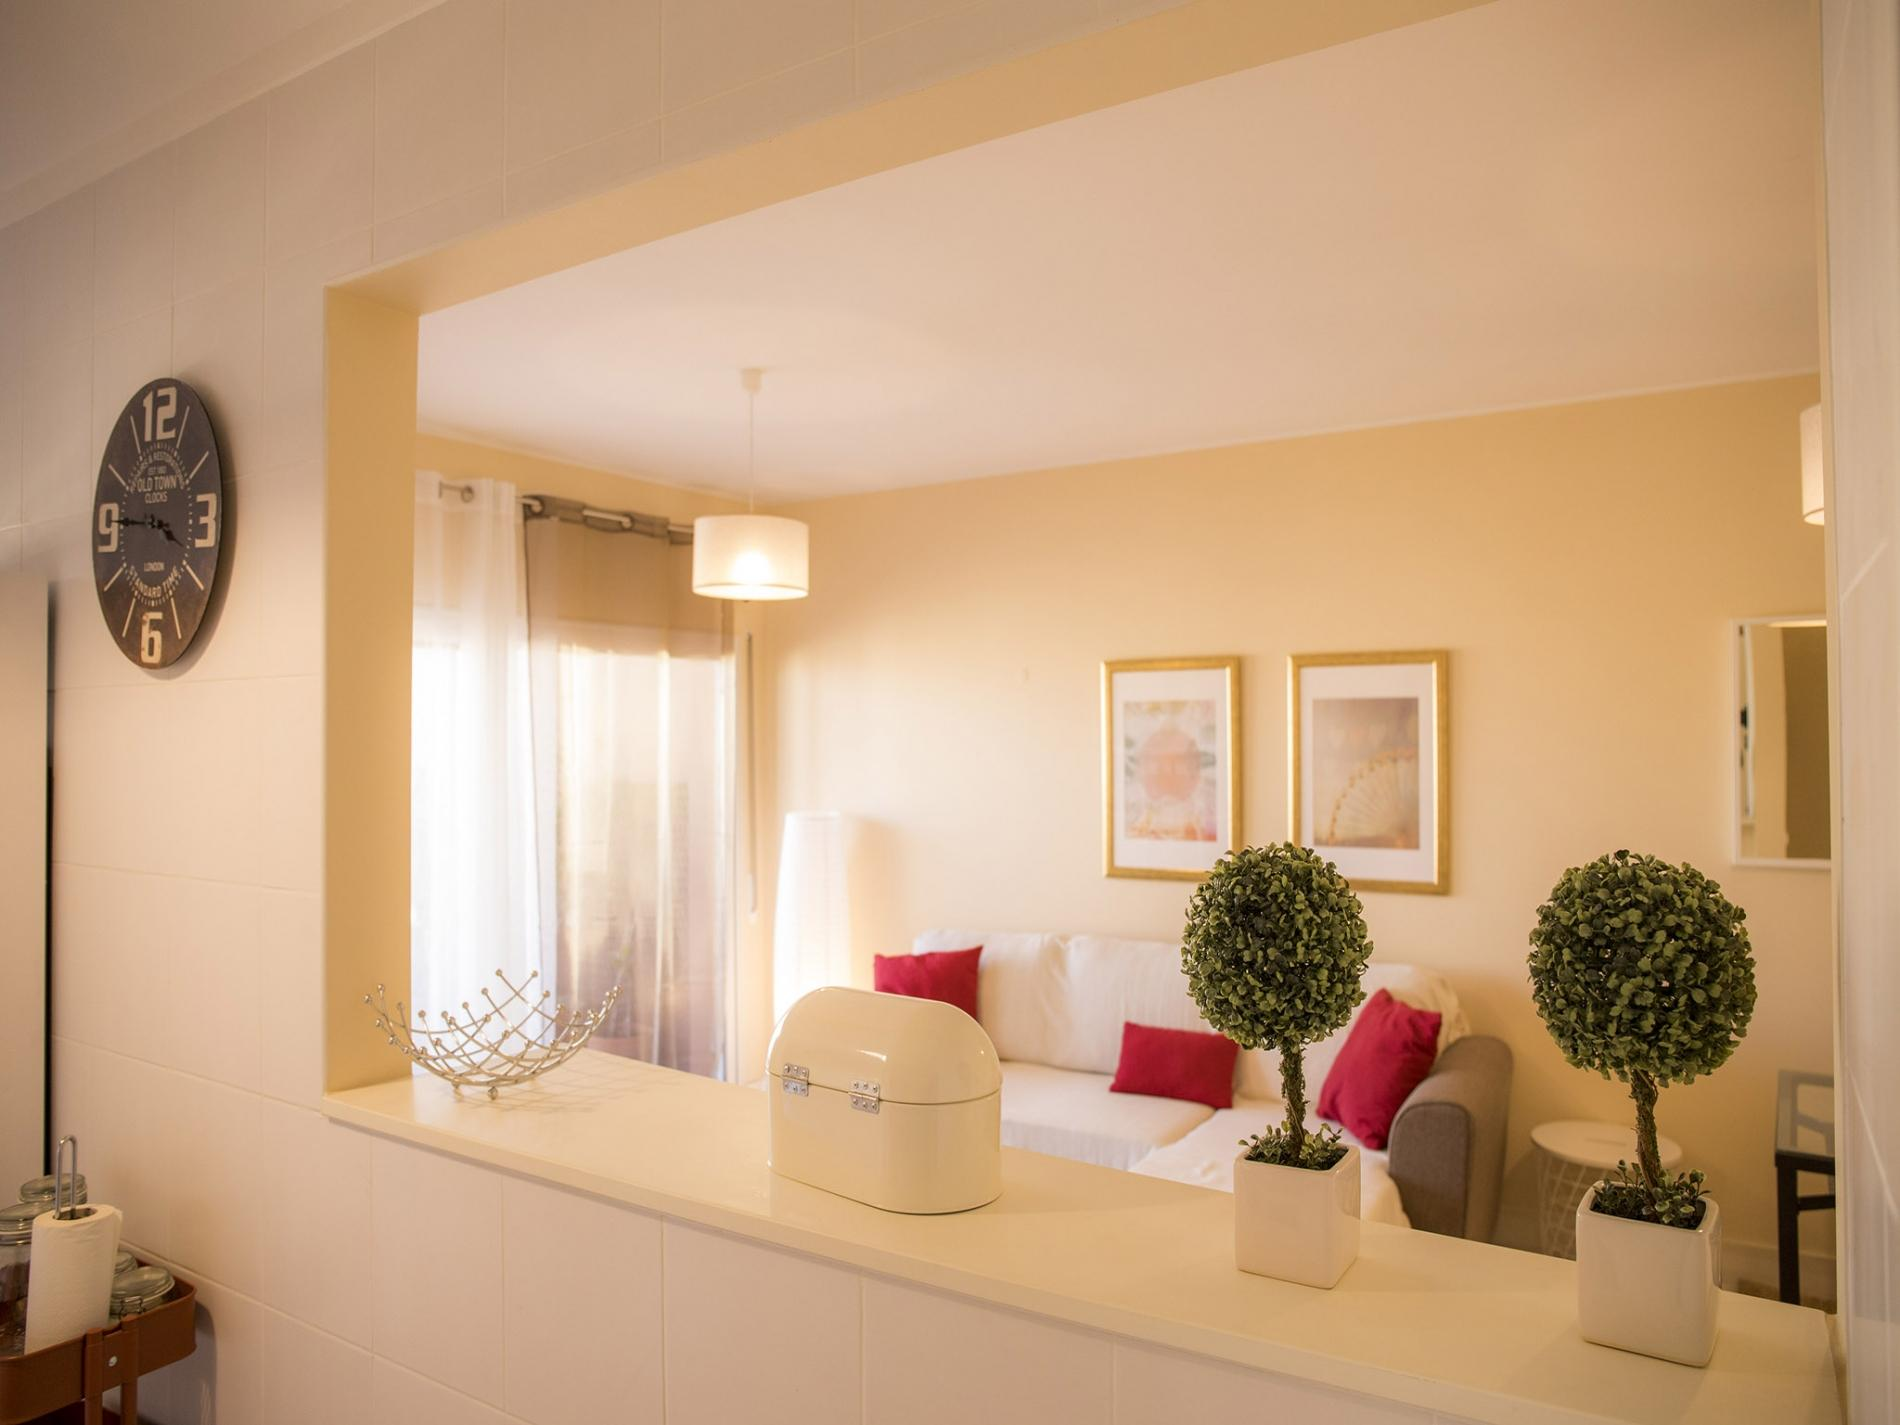 Apartment A20 - LitoralMar Apartment photo 22521167